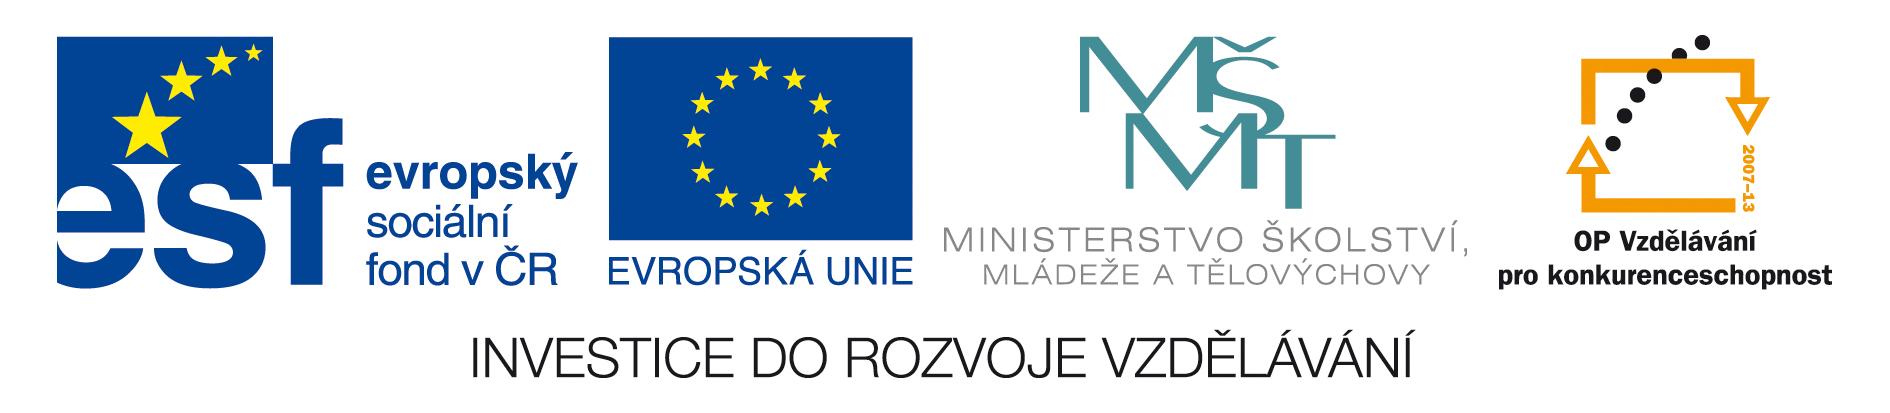 https://www.msmt.cz/uploads/soubory/Tiskovy_odbor/OPVK_hor_zakladni_logolink_RGB_cz.jpg